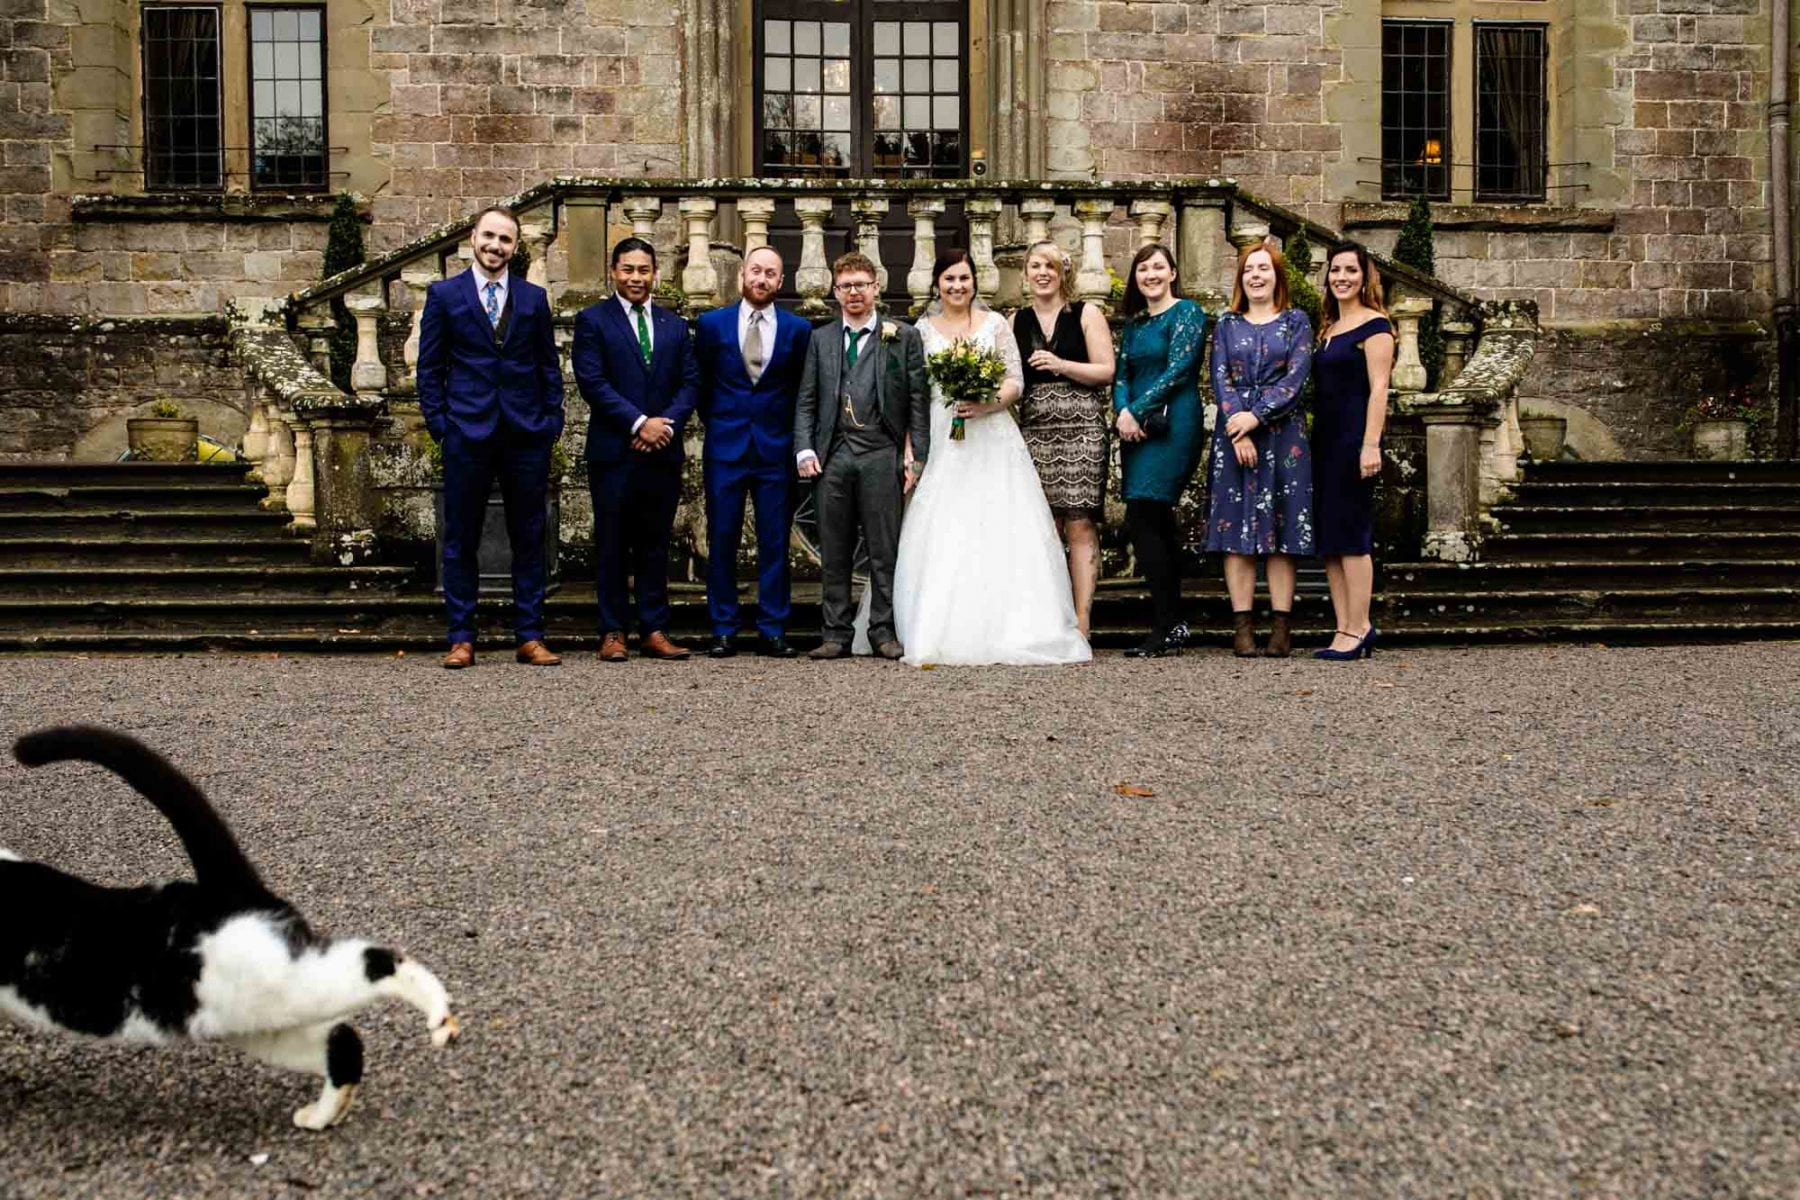 Clearwell Castle Fun Wedding Photos